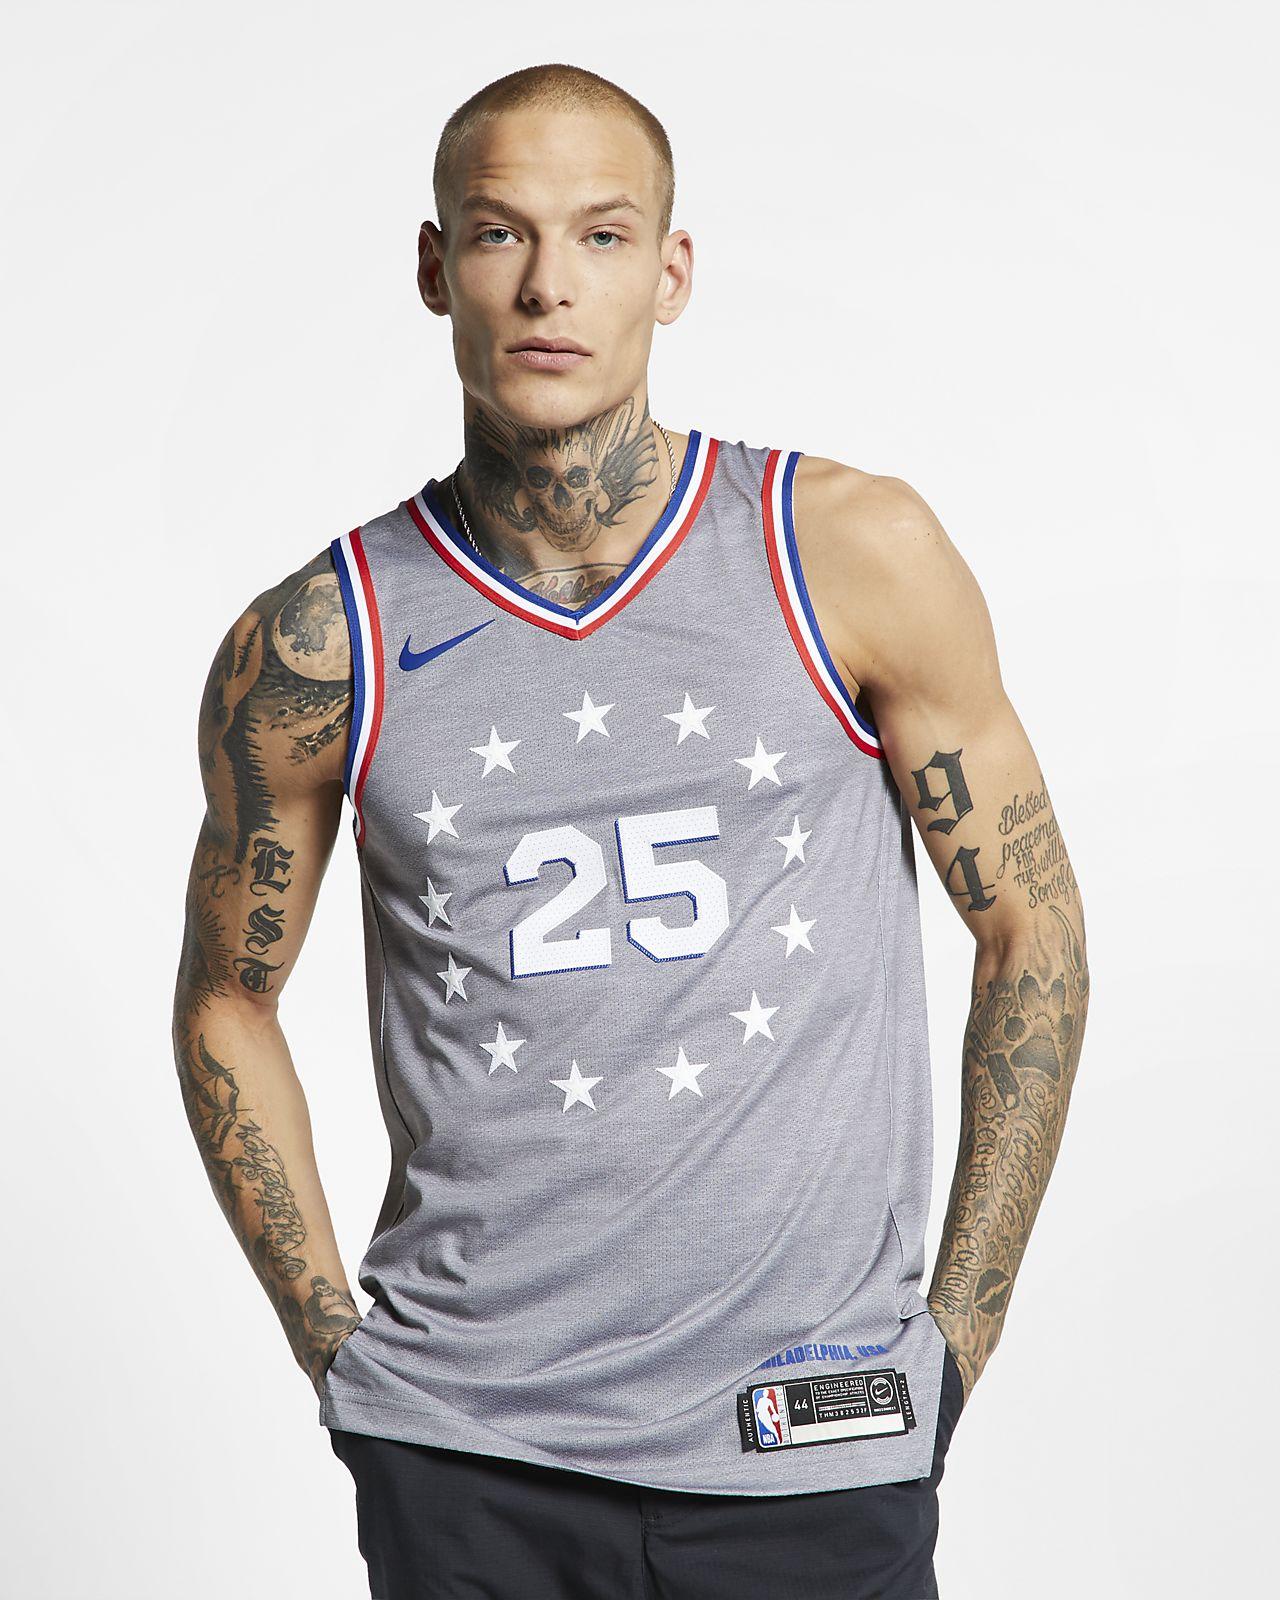 Men s Nike NBA Connected Jersey. Ben Simmons City Edition Authentic  (Philadelphia 76ers) 5d4a9c579